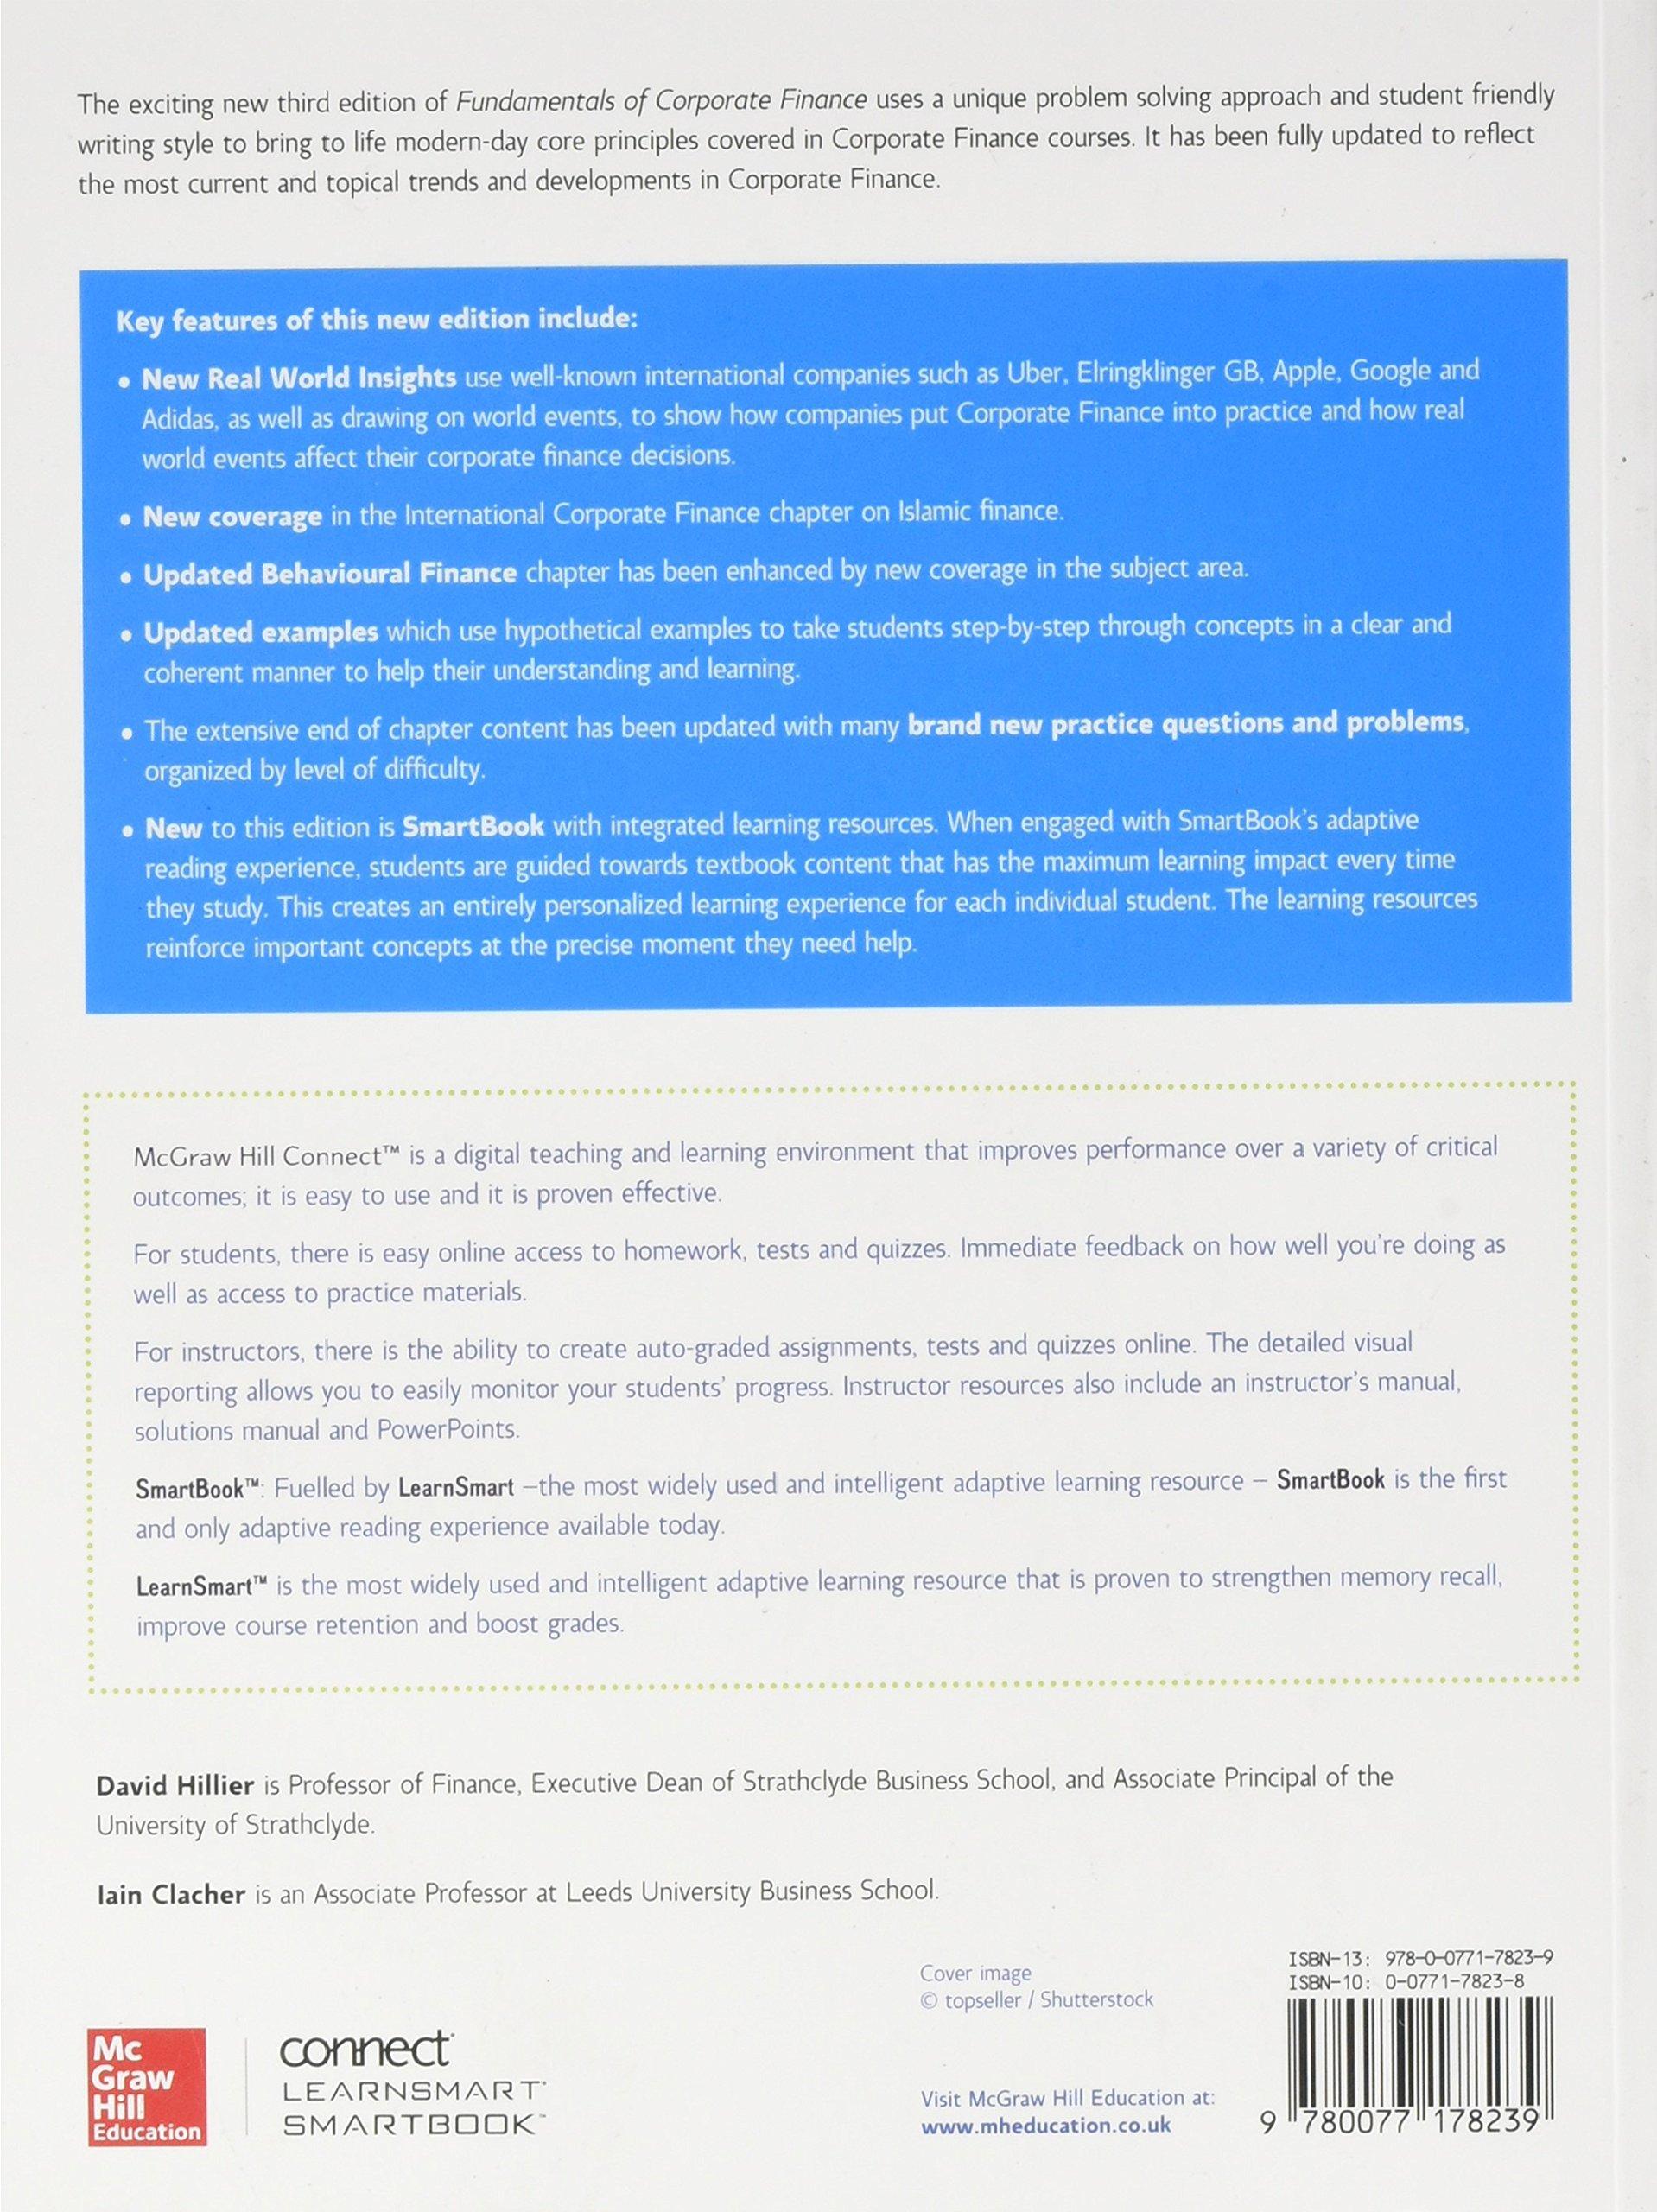 Fundamentals of corporate finance amazon bradford jordan fundamentals of corporate finance amazon bradford jordan randolph westerfield iain clacher stephen a ross david hillier 9780077178239 books fandeluxe Image collections